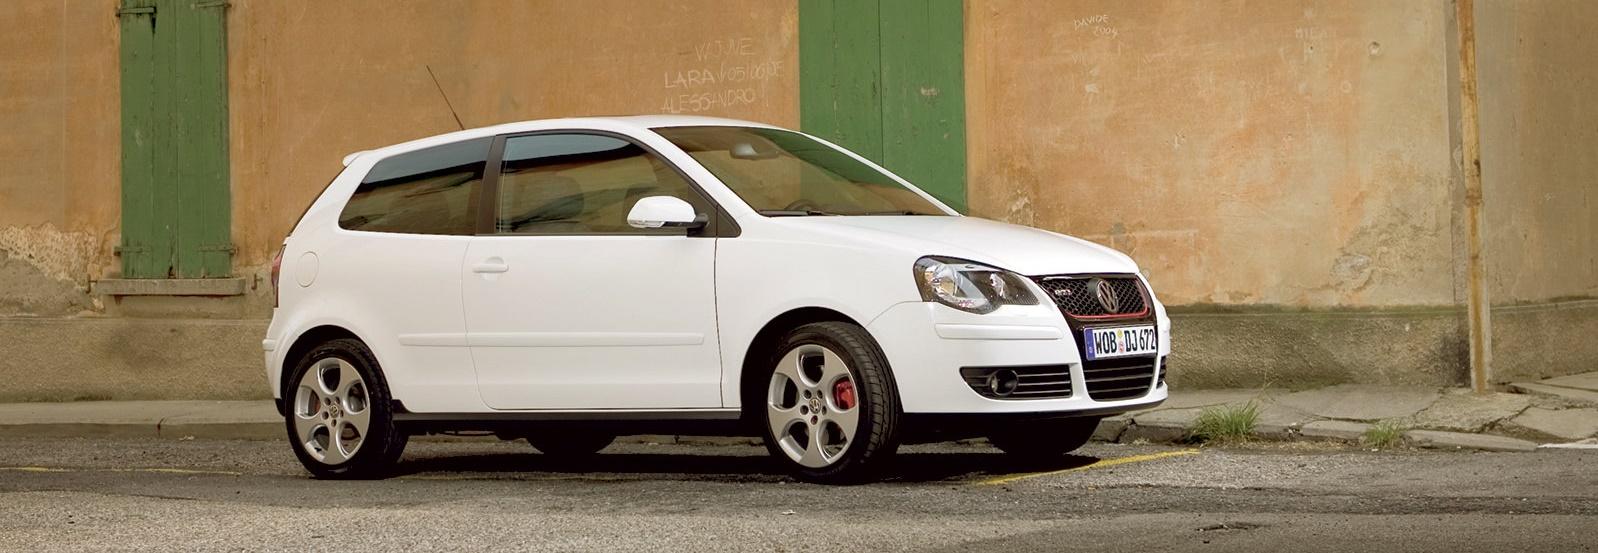 Volkswagen-Polo_GTI-2006-1600-02